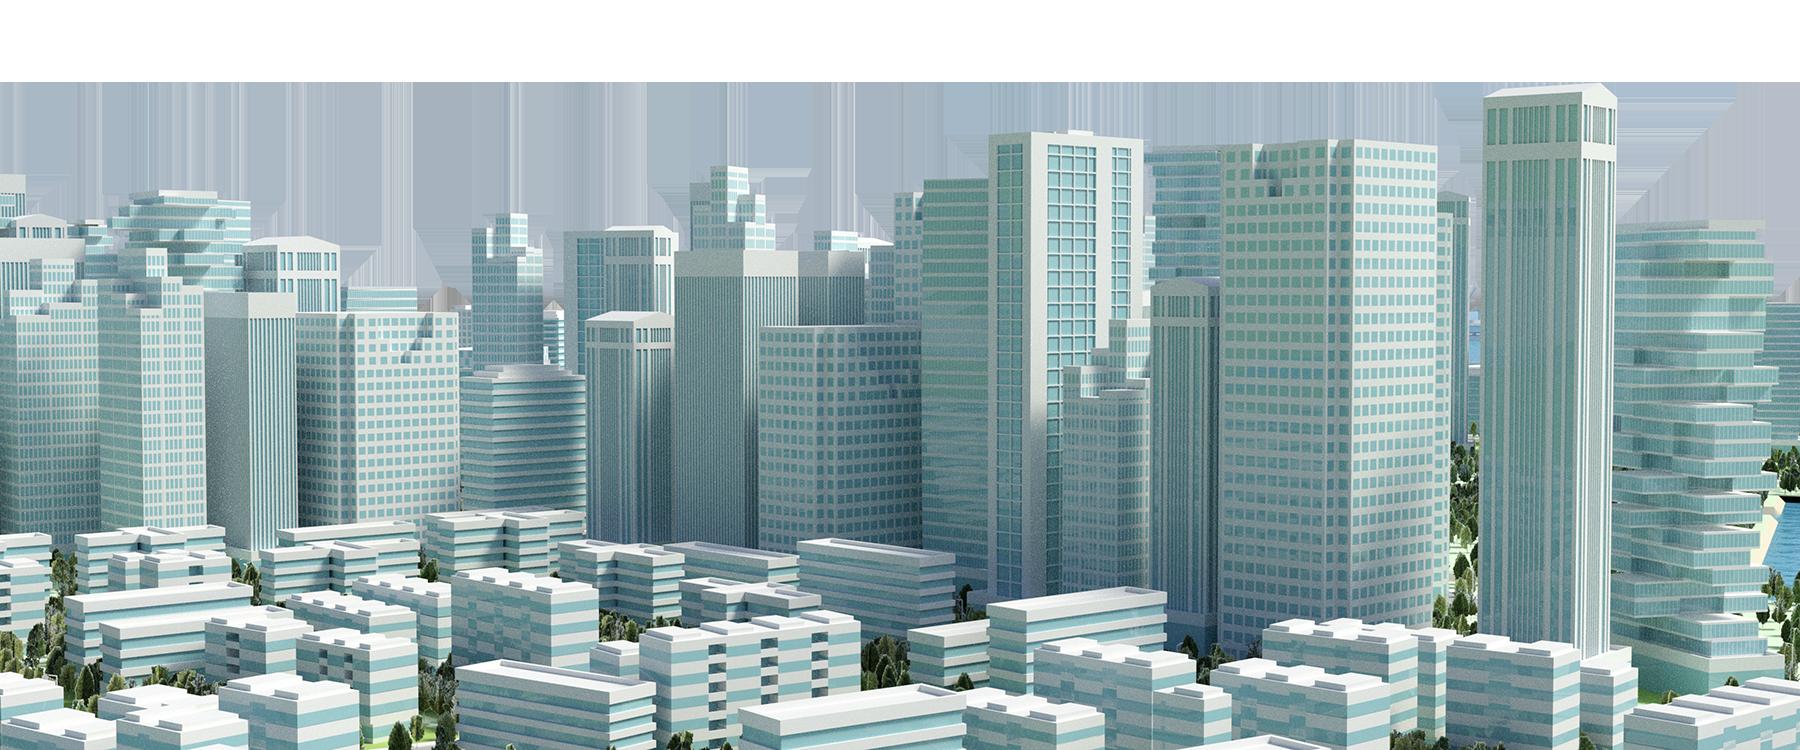 banner transparent stock City Buildings PNG Image